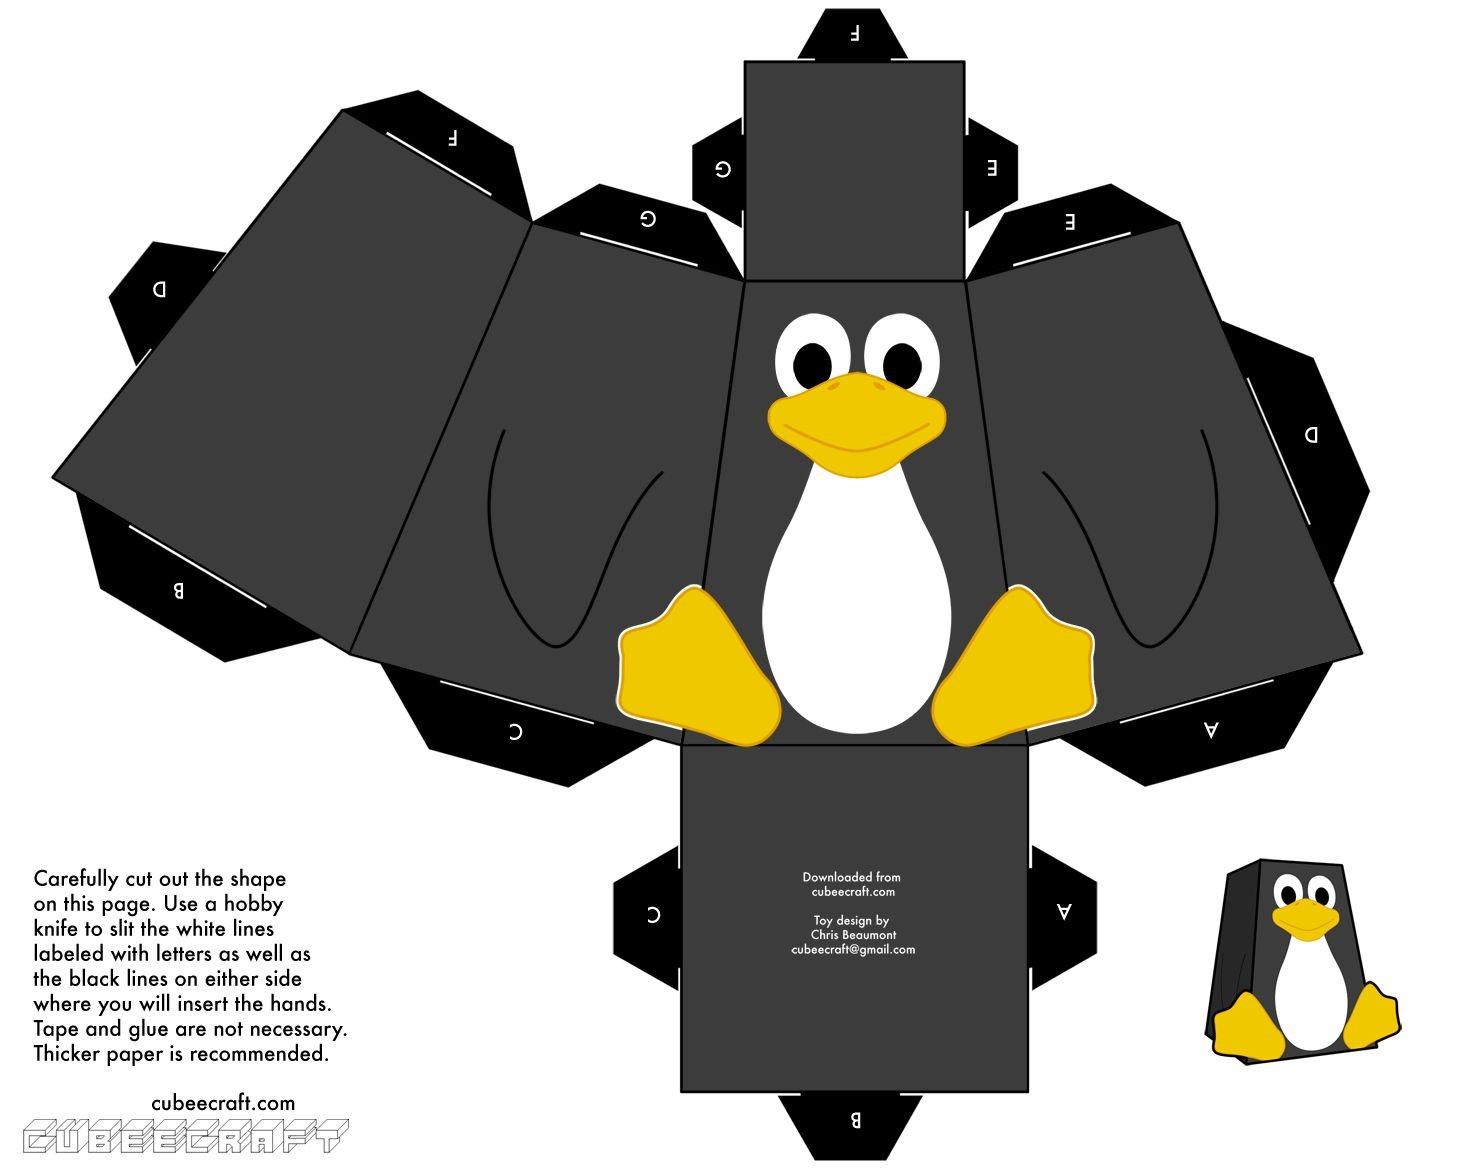 Papercraft Penguin Papercraft Y Cubeecraft Para Armar Paper Figurines